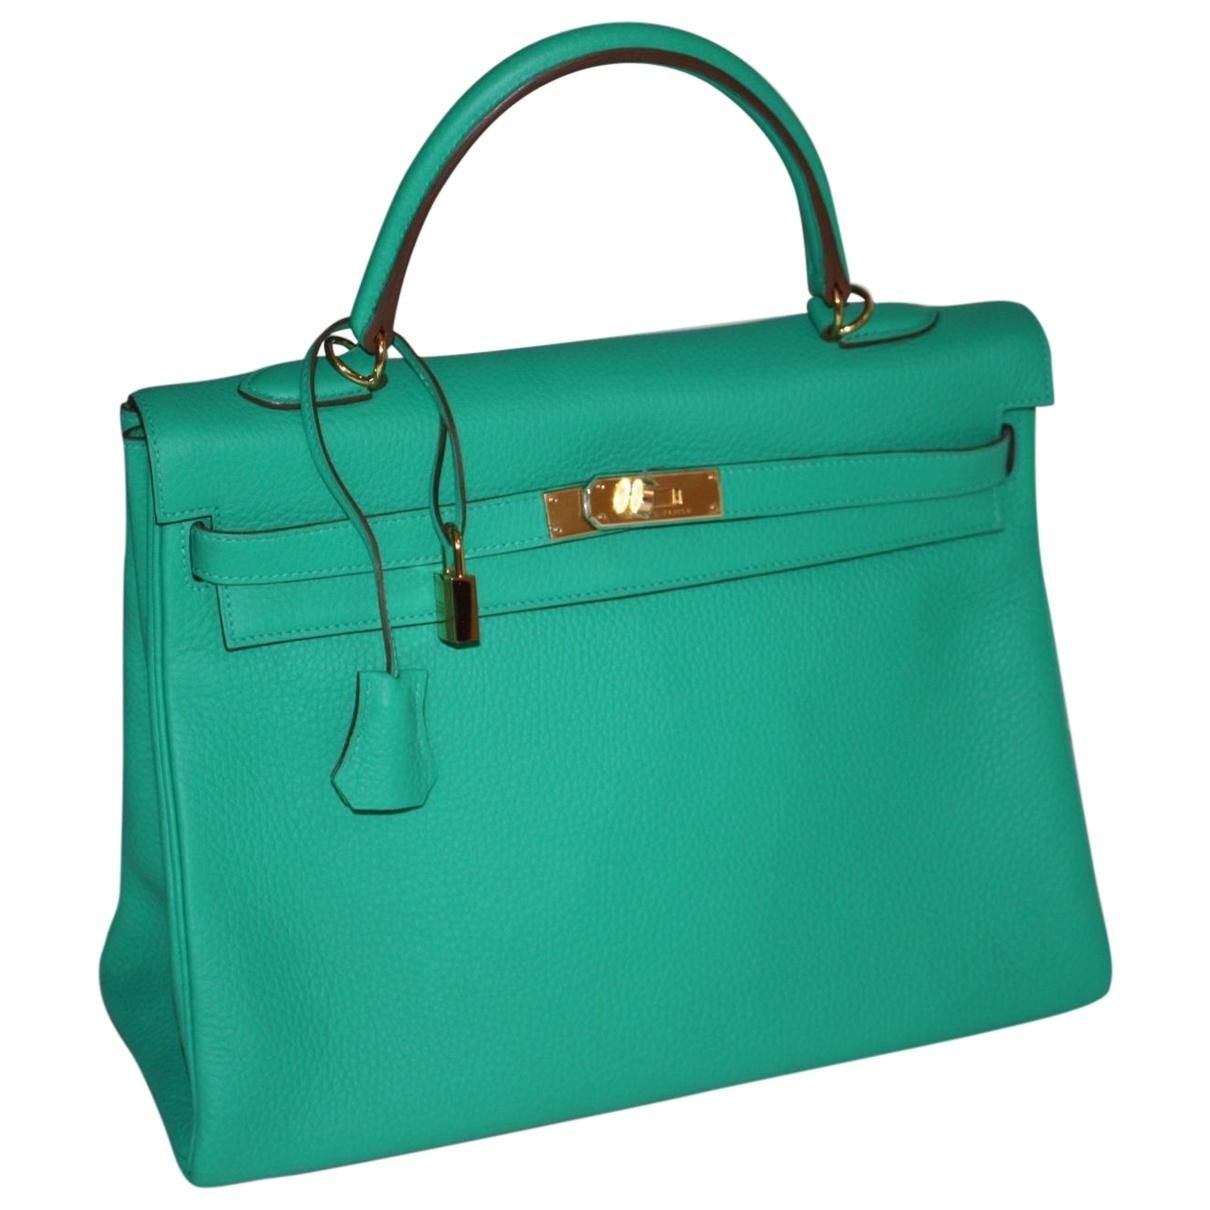 Hermes Kelly 35 Handtasche in  Gruen Leder